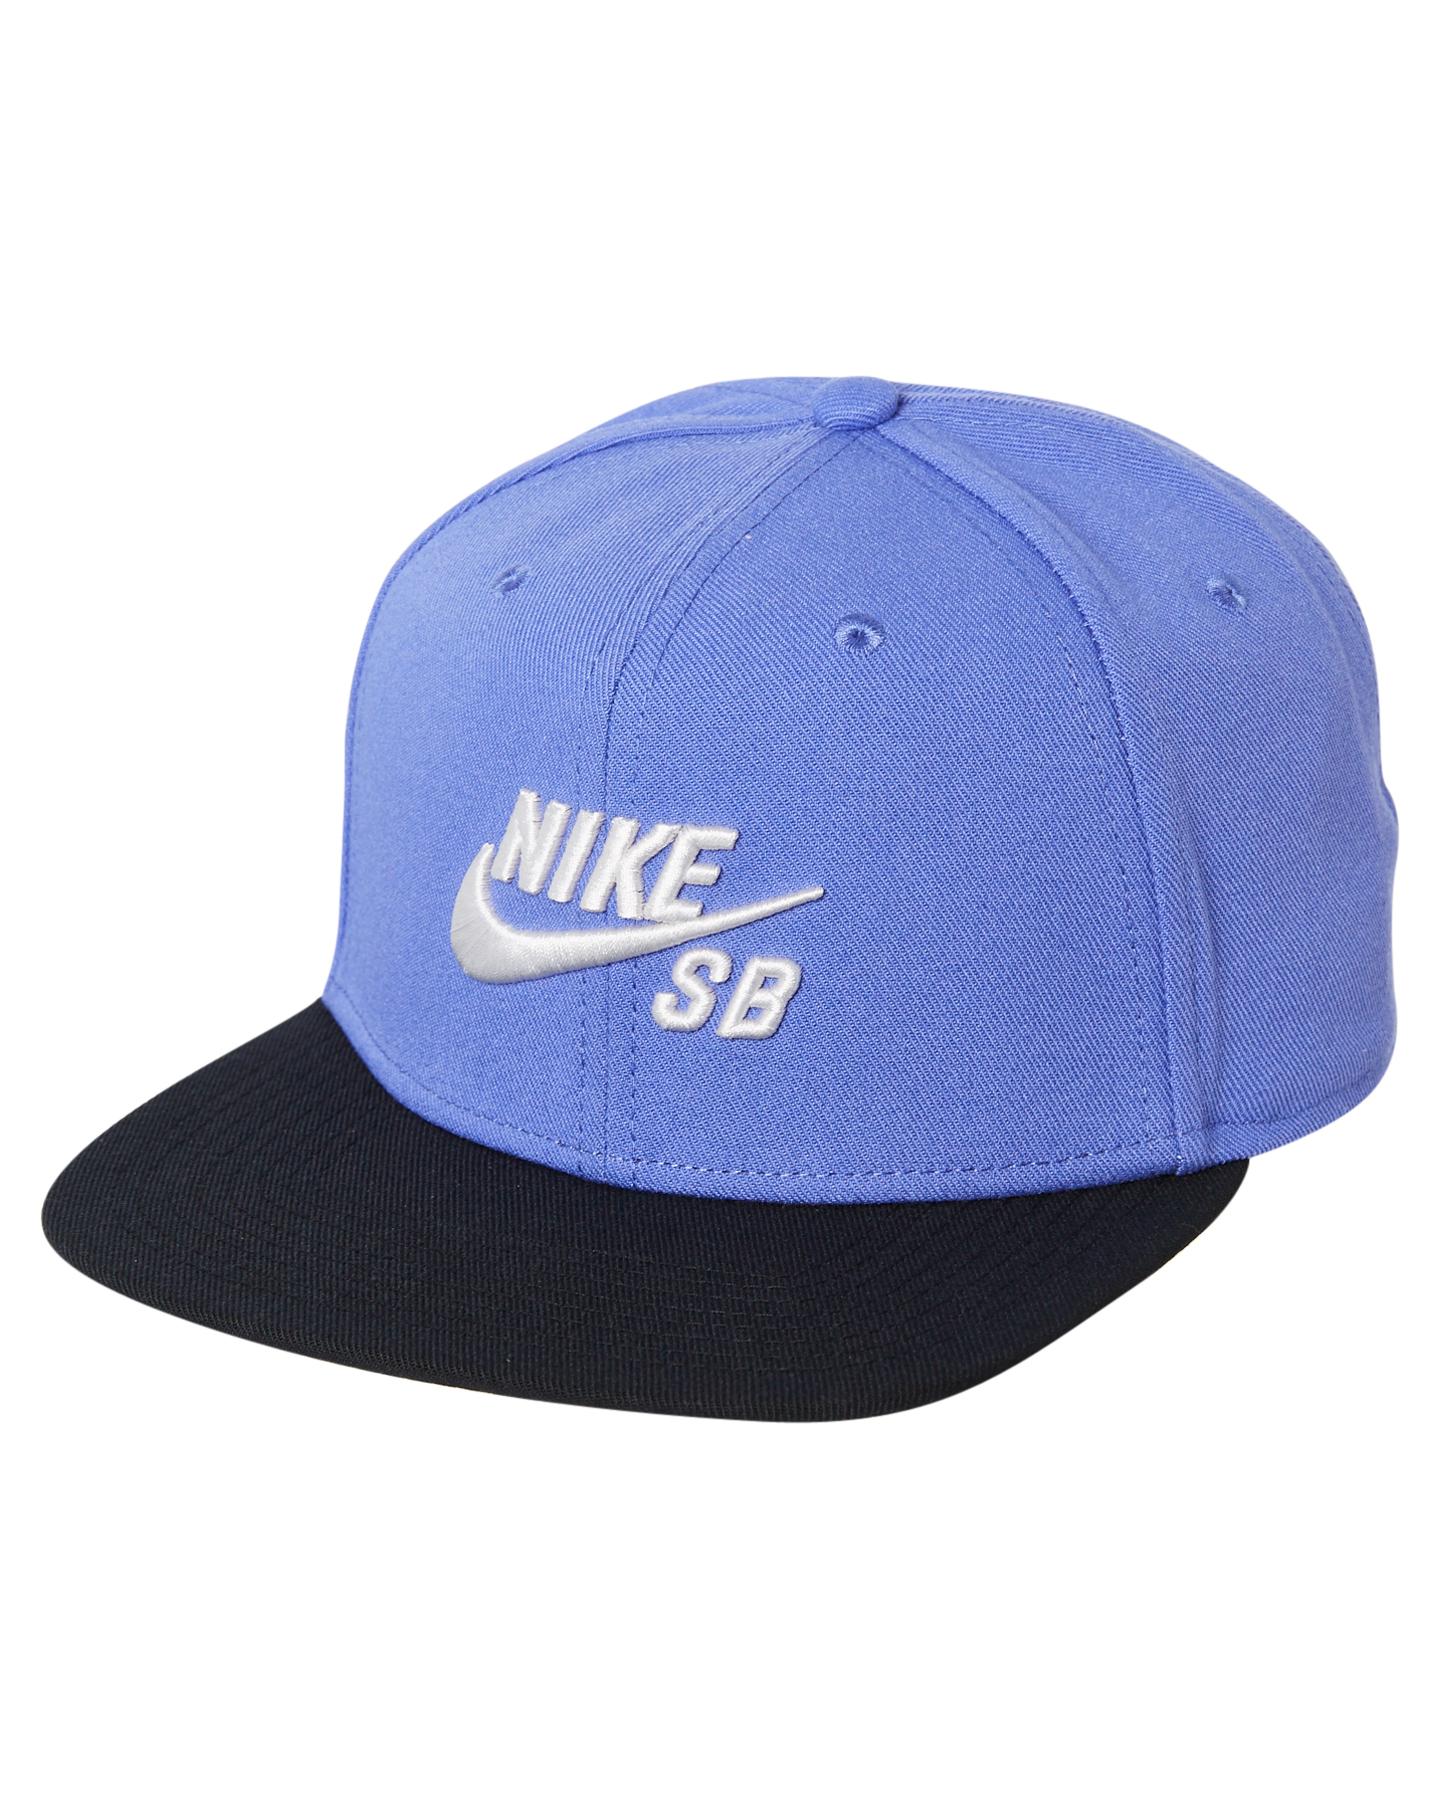 720880bc728 Nike Sb Icon Snapback Cap - Rush Violet Black